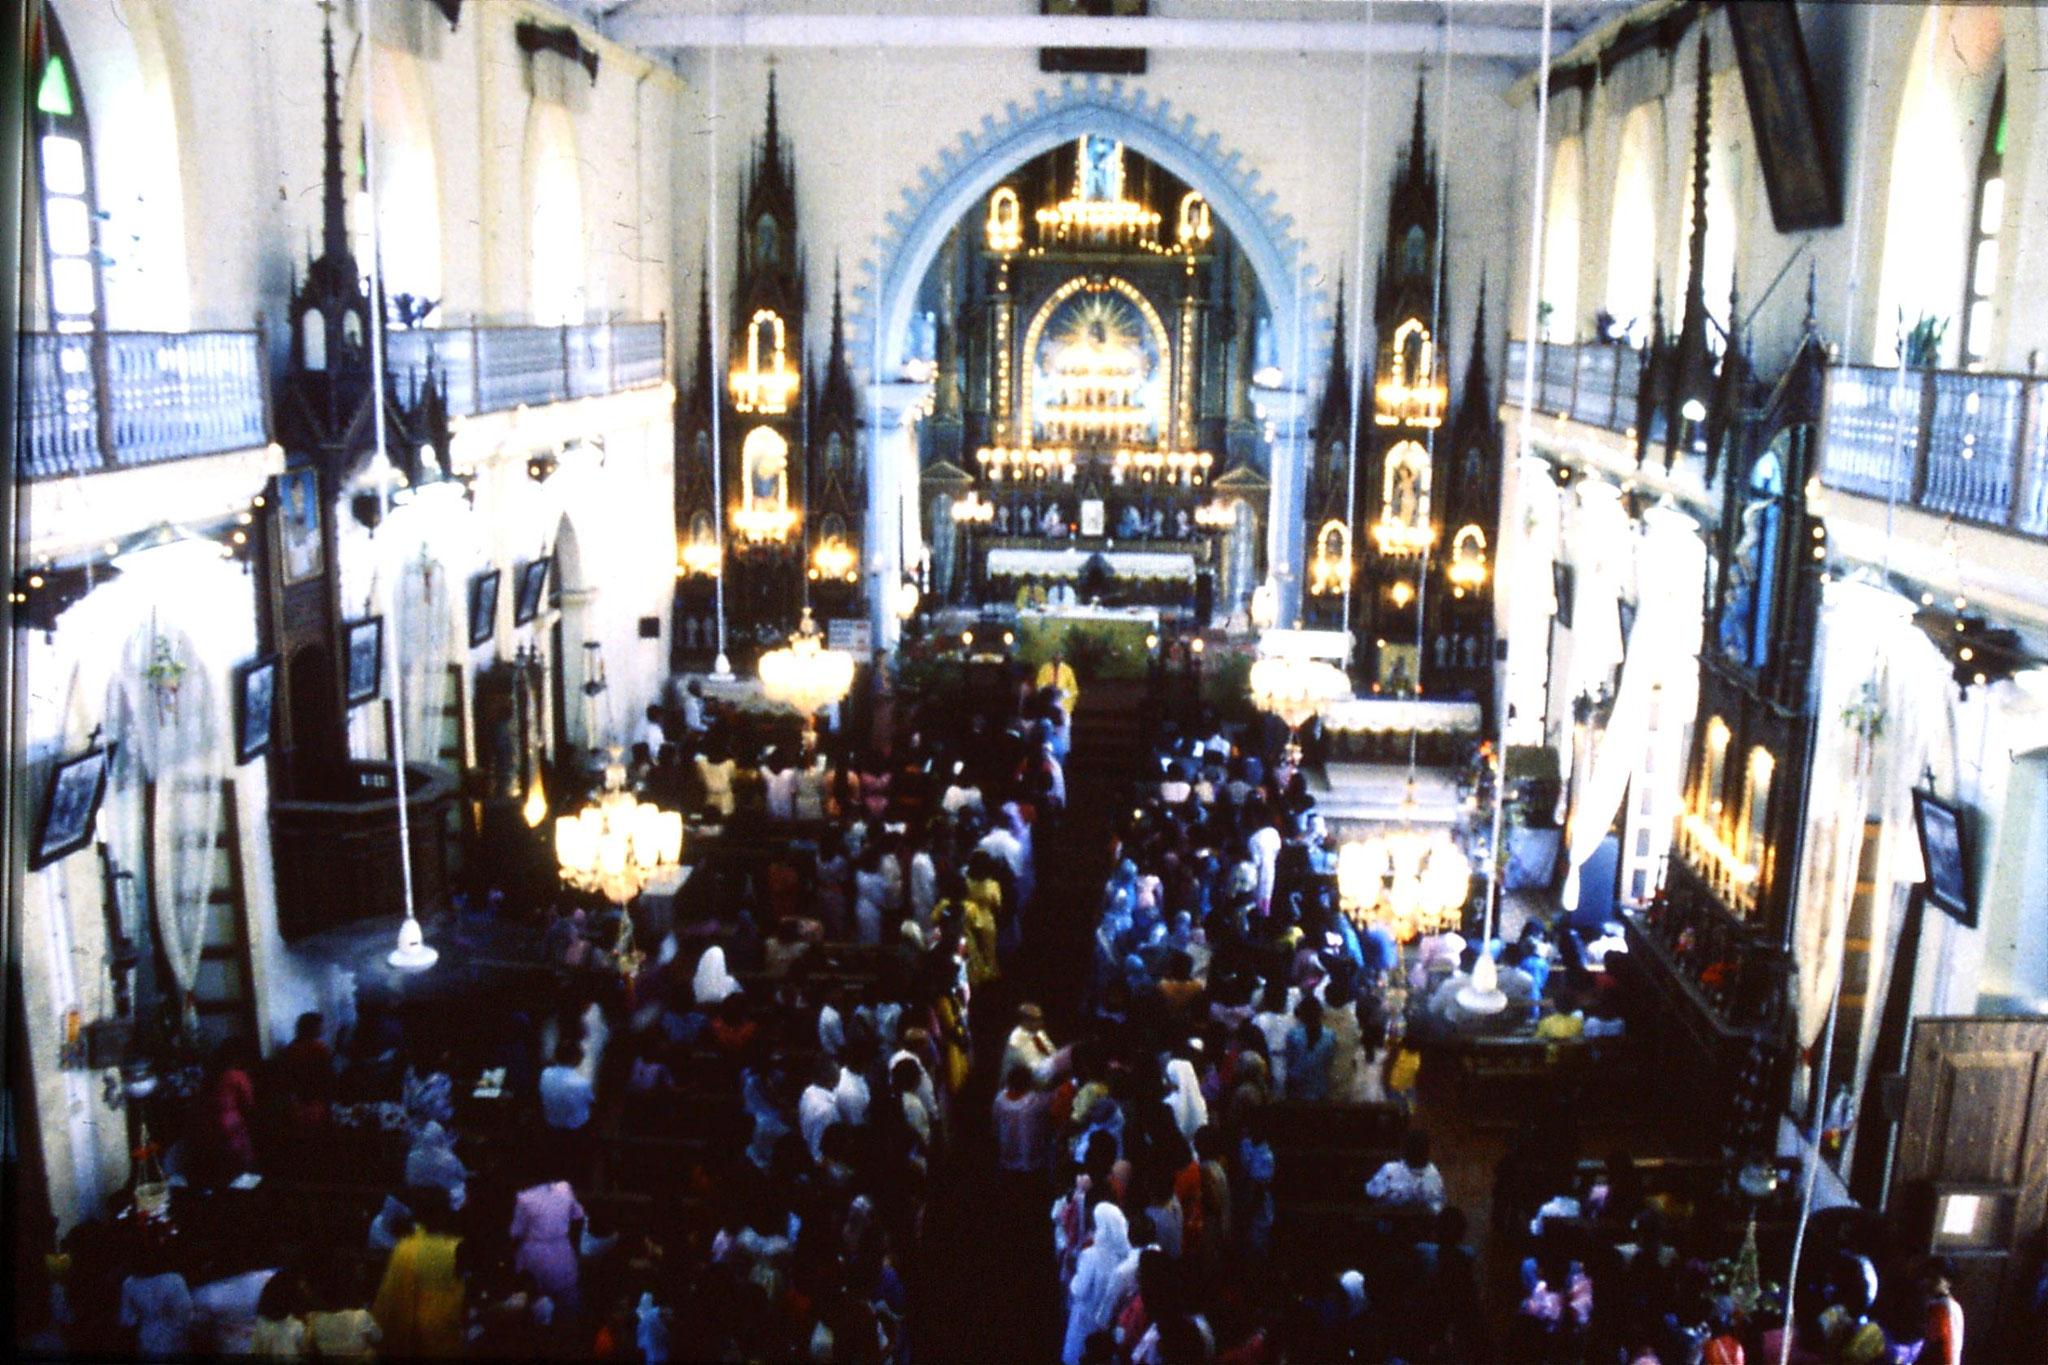 31/12/1989: 10: Siolim church and 10.30 mass